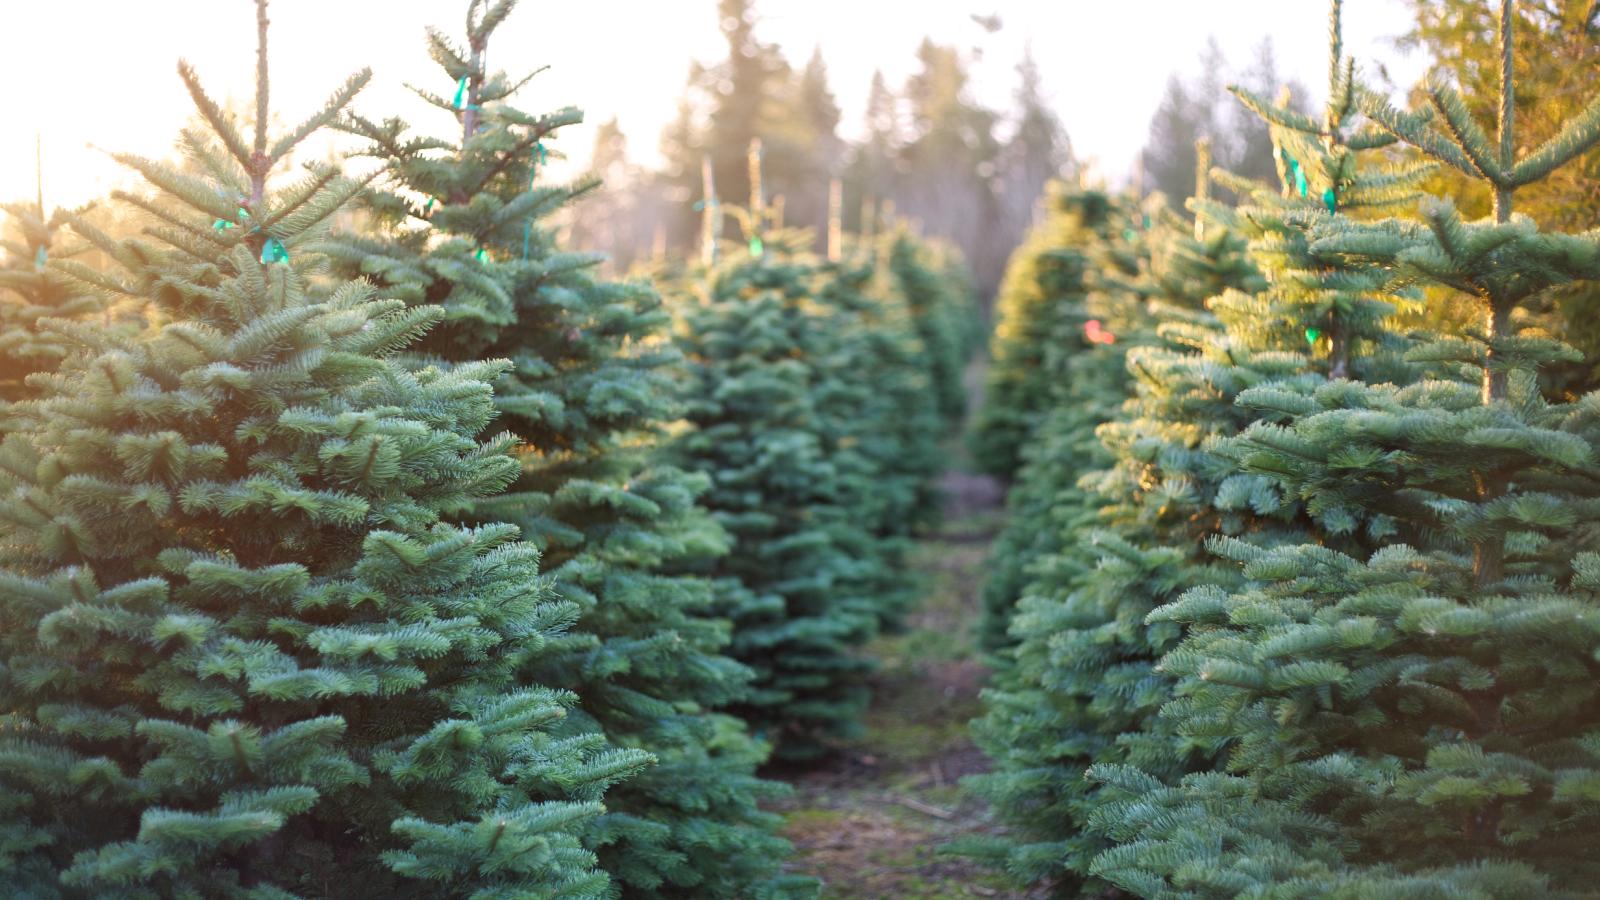 Staying Apart, Together: A Christmas tree metaphor for pandemic life